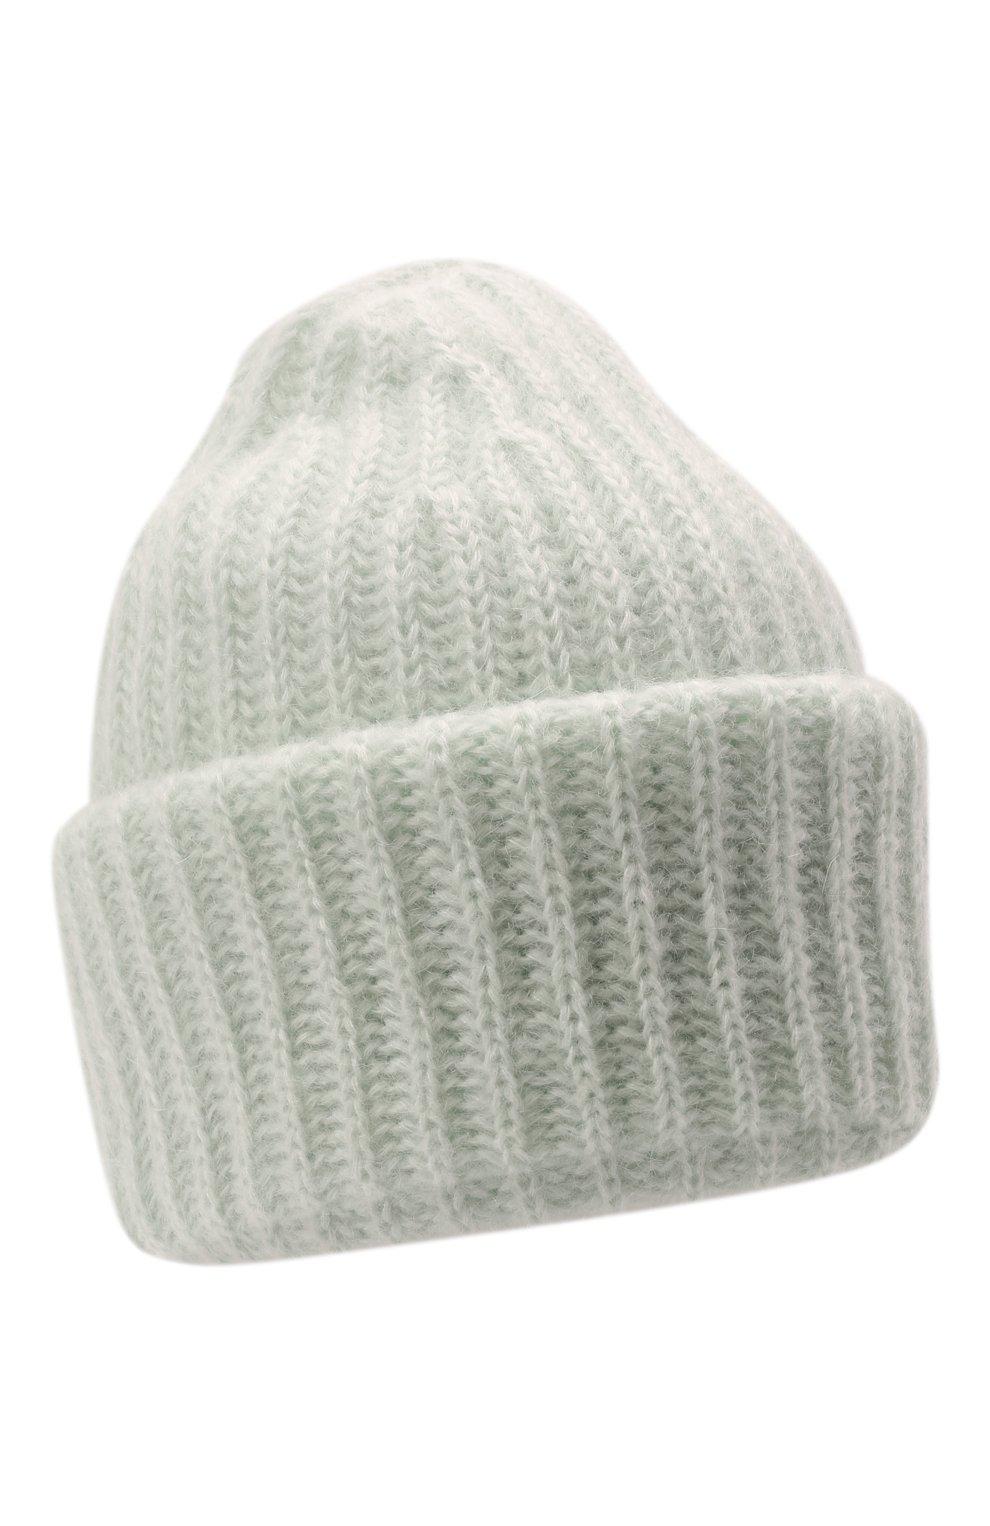 Женская шапка TAK.ORI светло-зеленого цвета, арт. AC043MW018PF17 | Фото 1 (Материал: Текстиль, Шерсть, Синтетический материал)